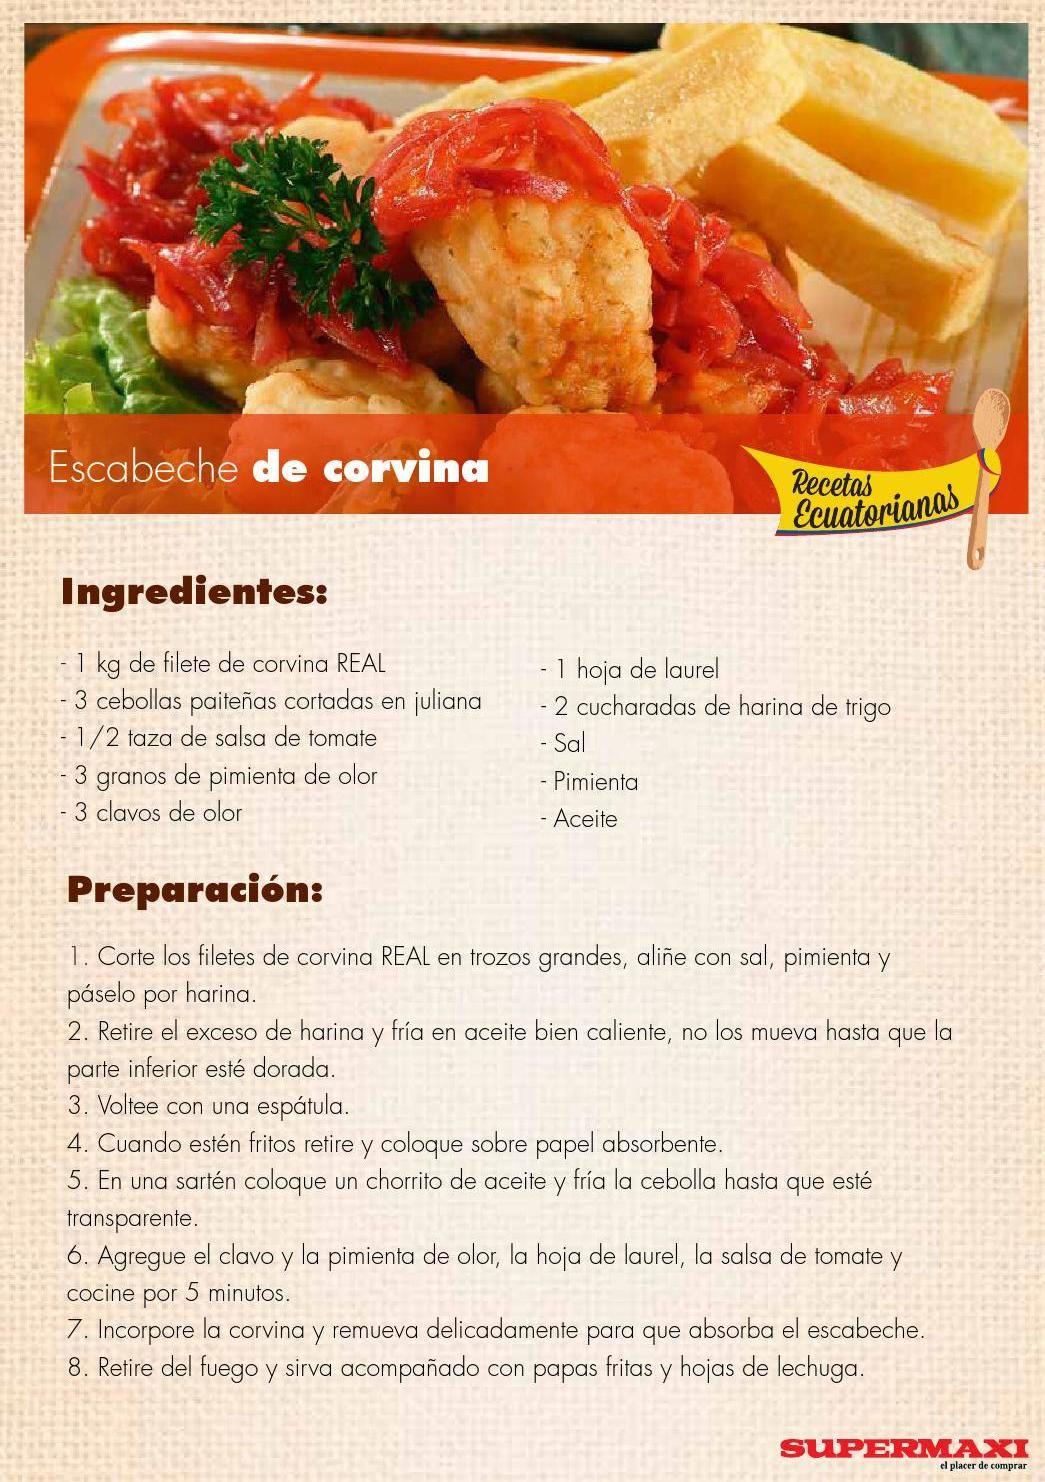 Recetas ecuatorianas for Cocina 5 ingredientes jamie